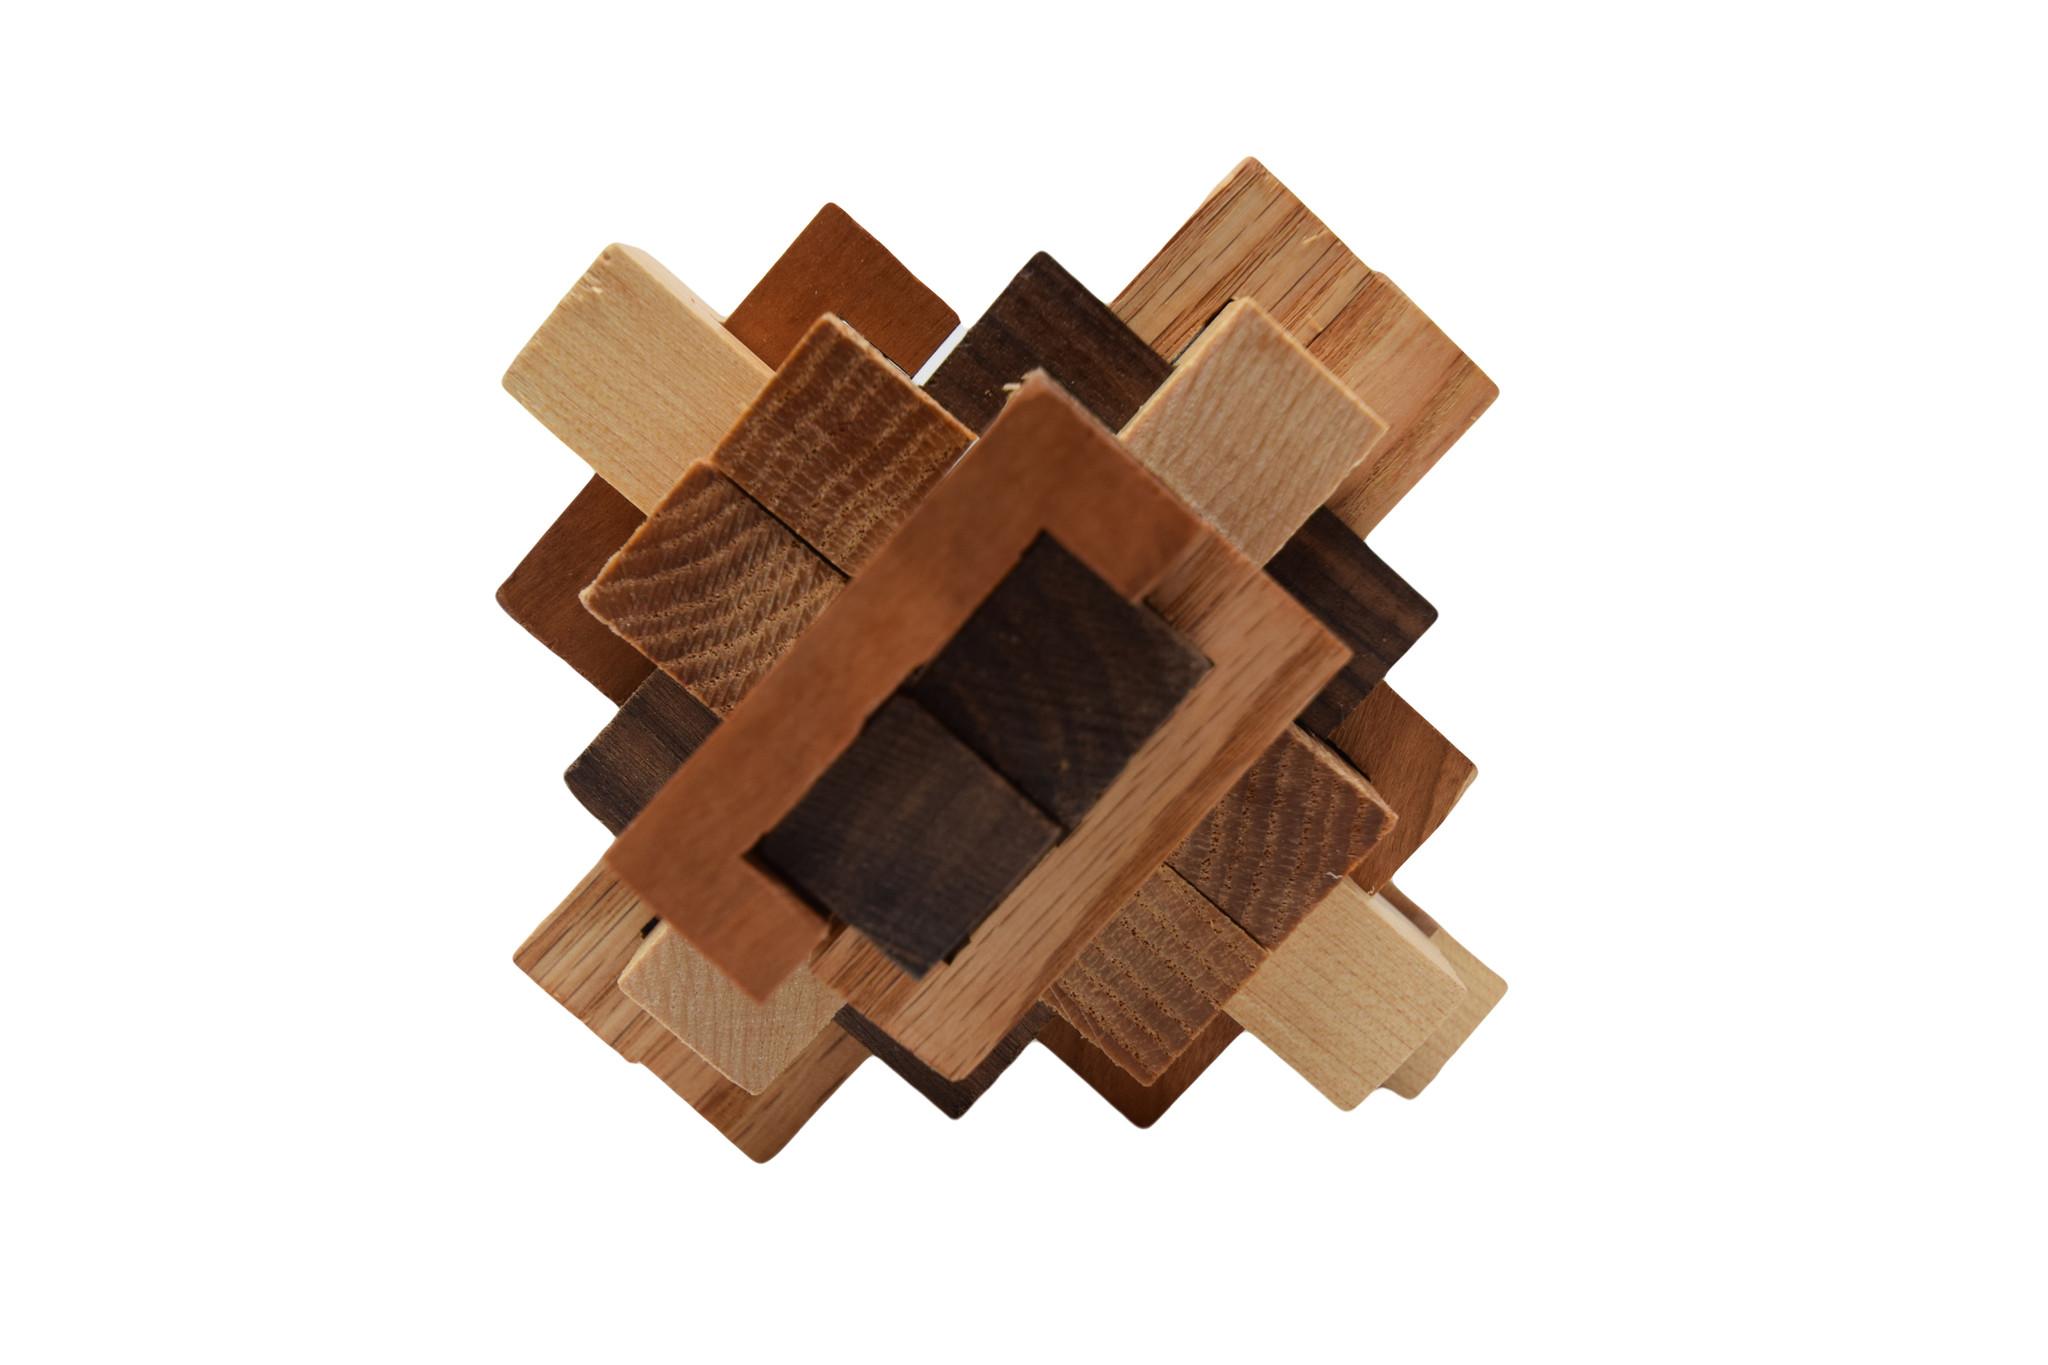 24 Piece Puzzle-2